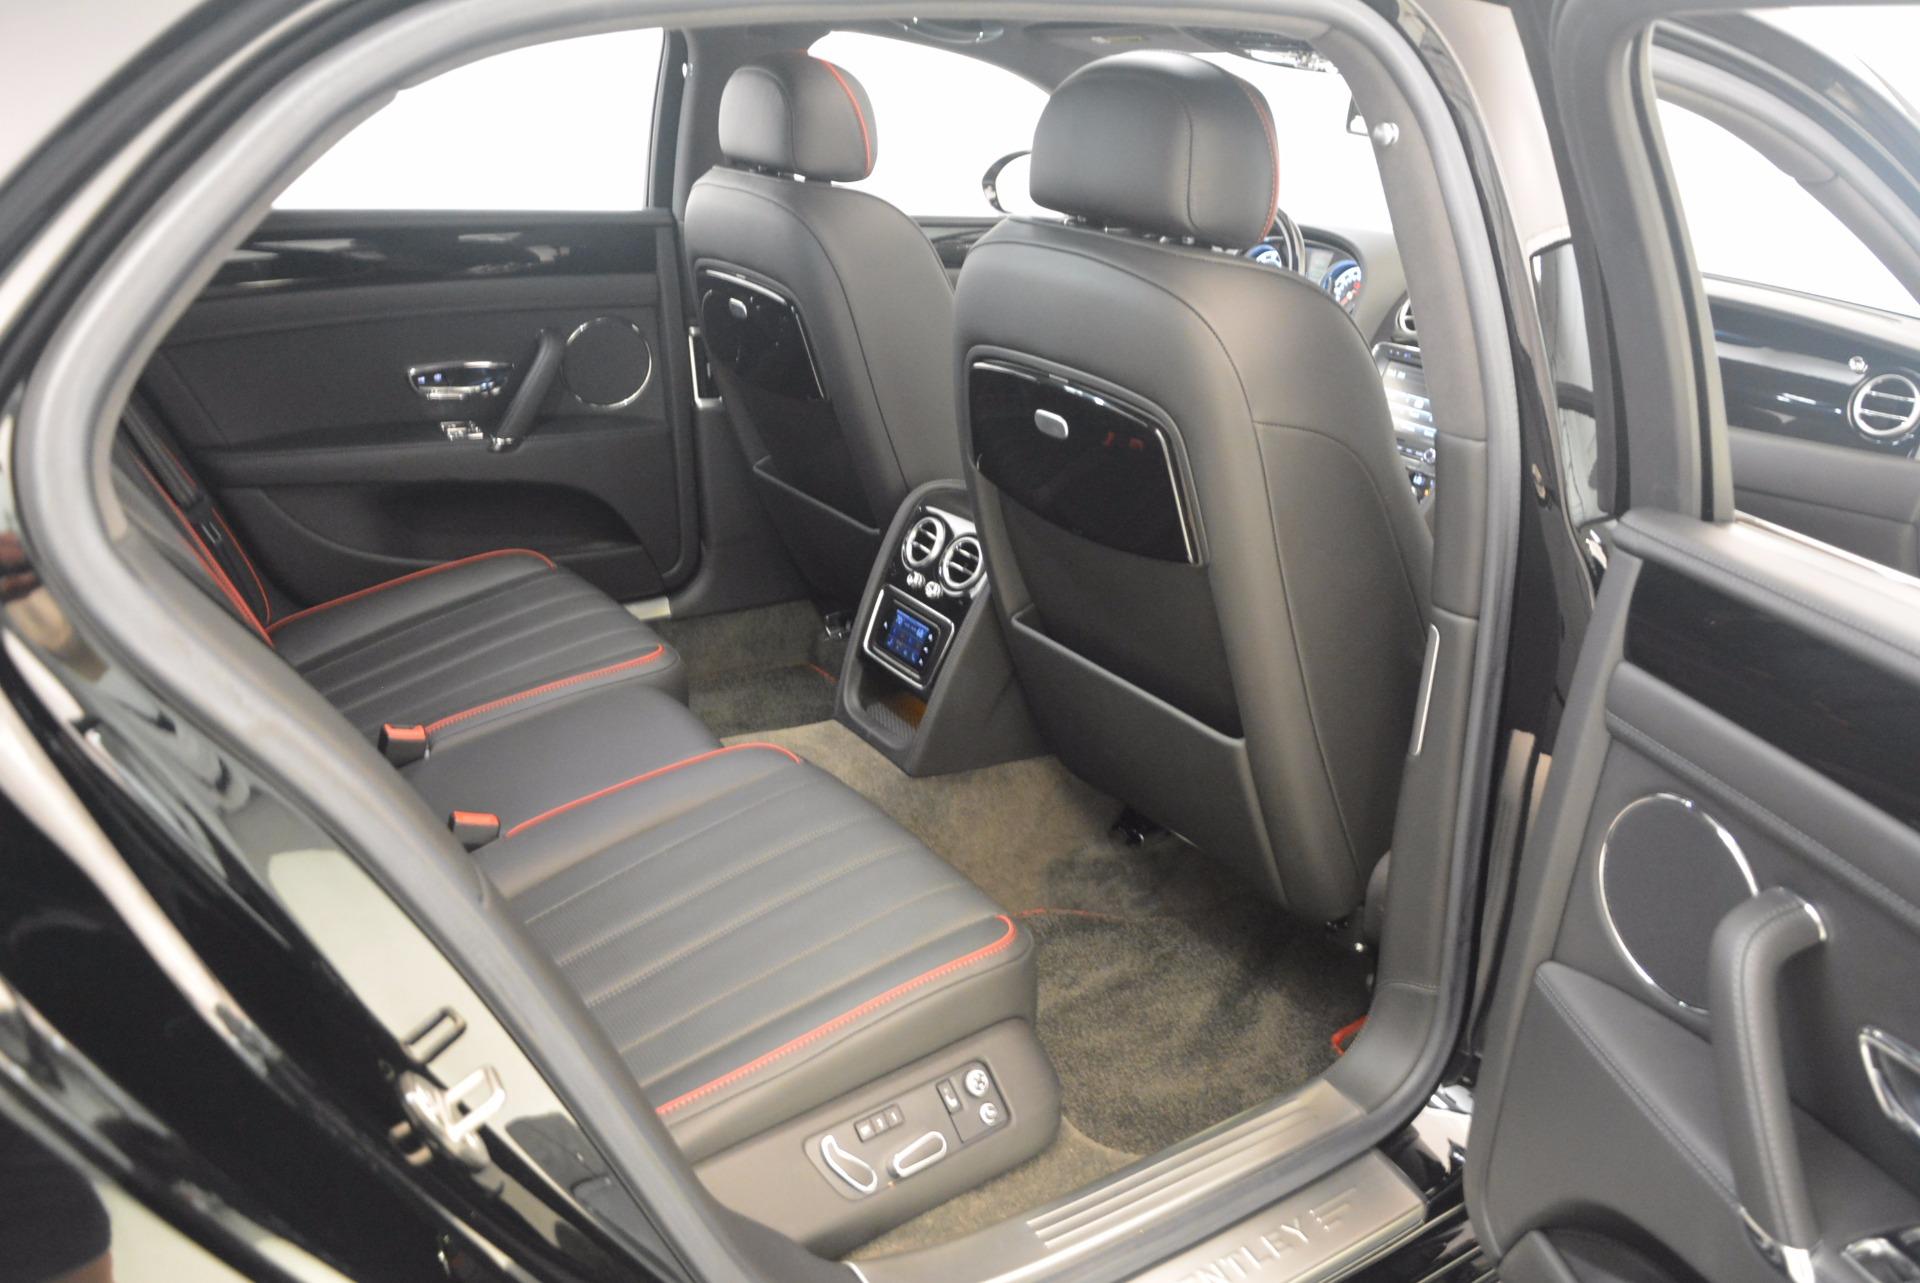 Used 2015 Bentley Flying Spur V8 For Sale In Westport, CT 1199_p44